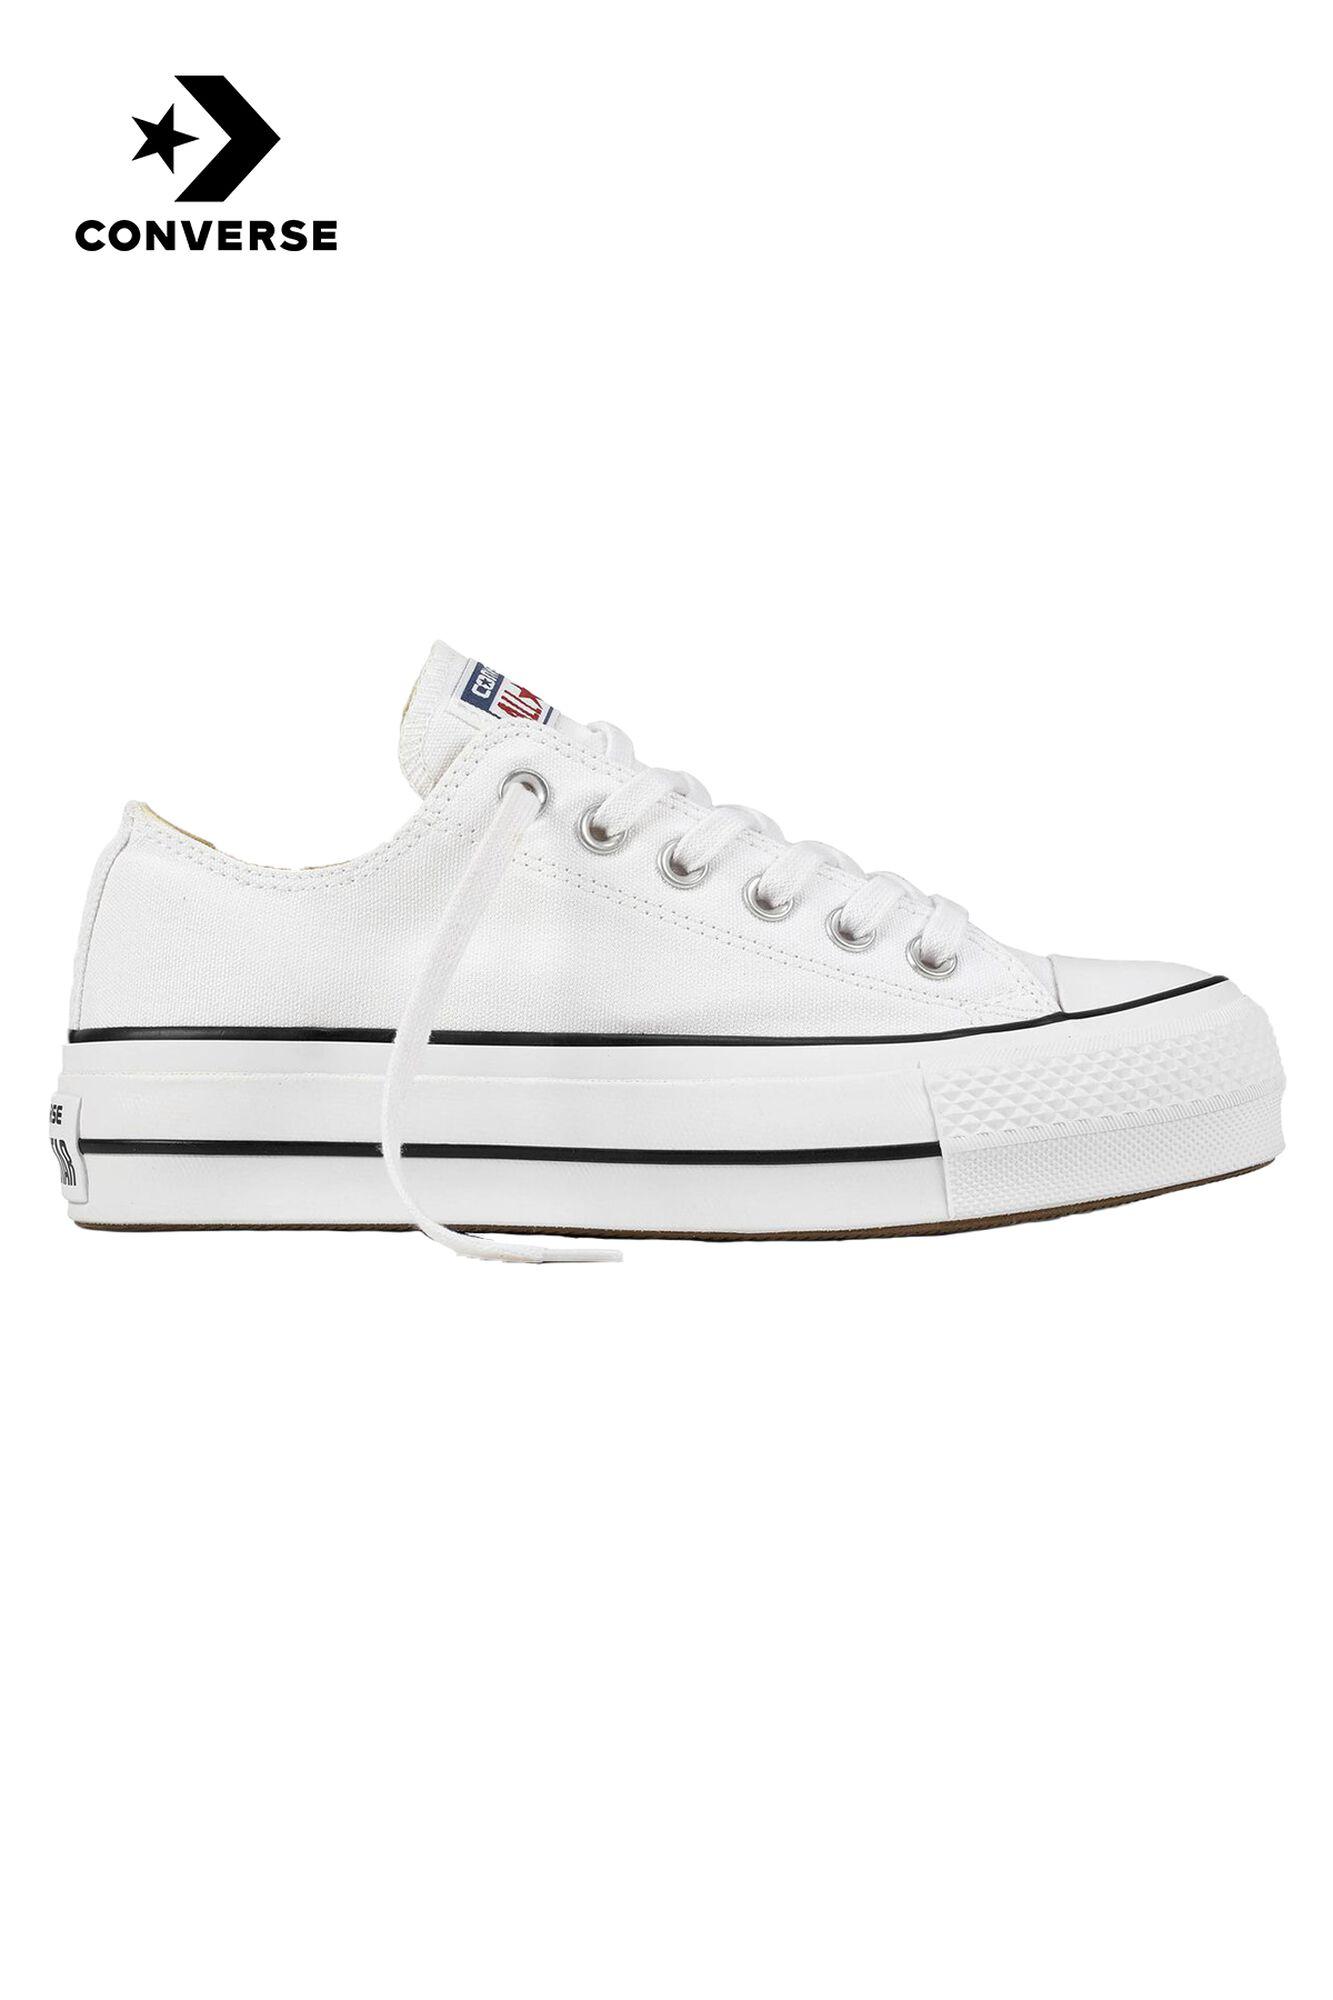 0d873532846461 Women Converse All Stars OX Lift White Buy Online